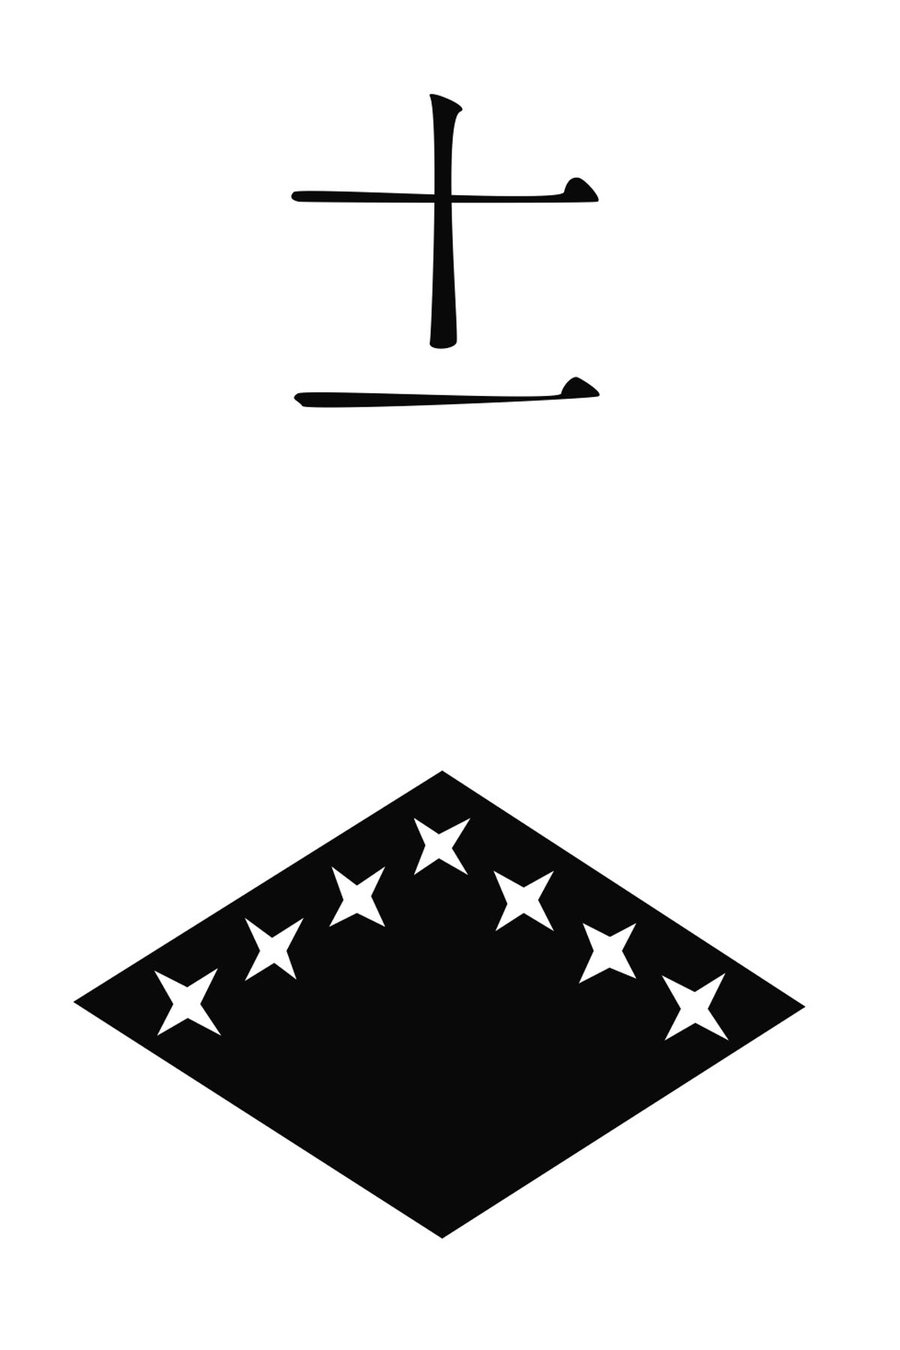 Eleventh Division